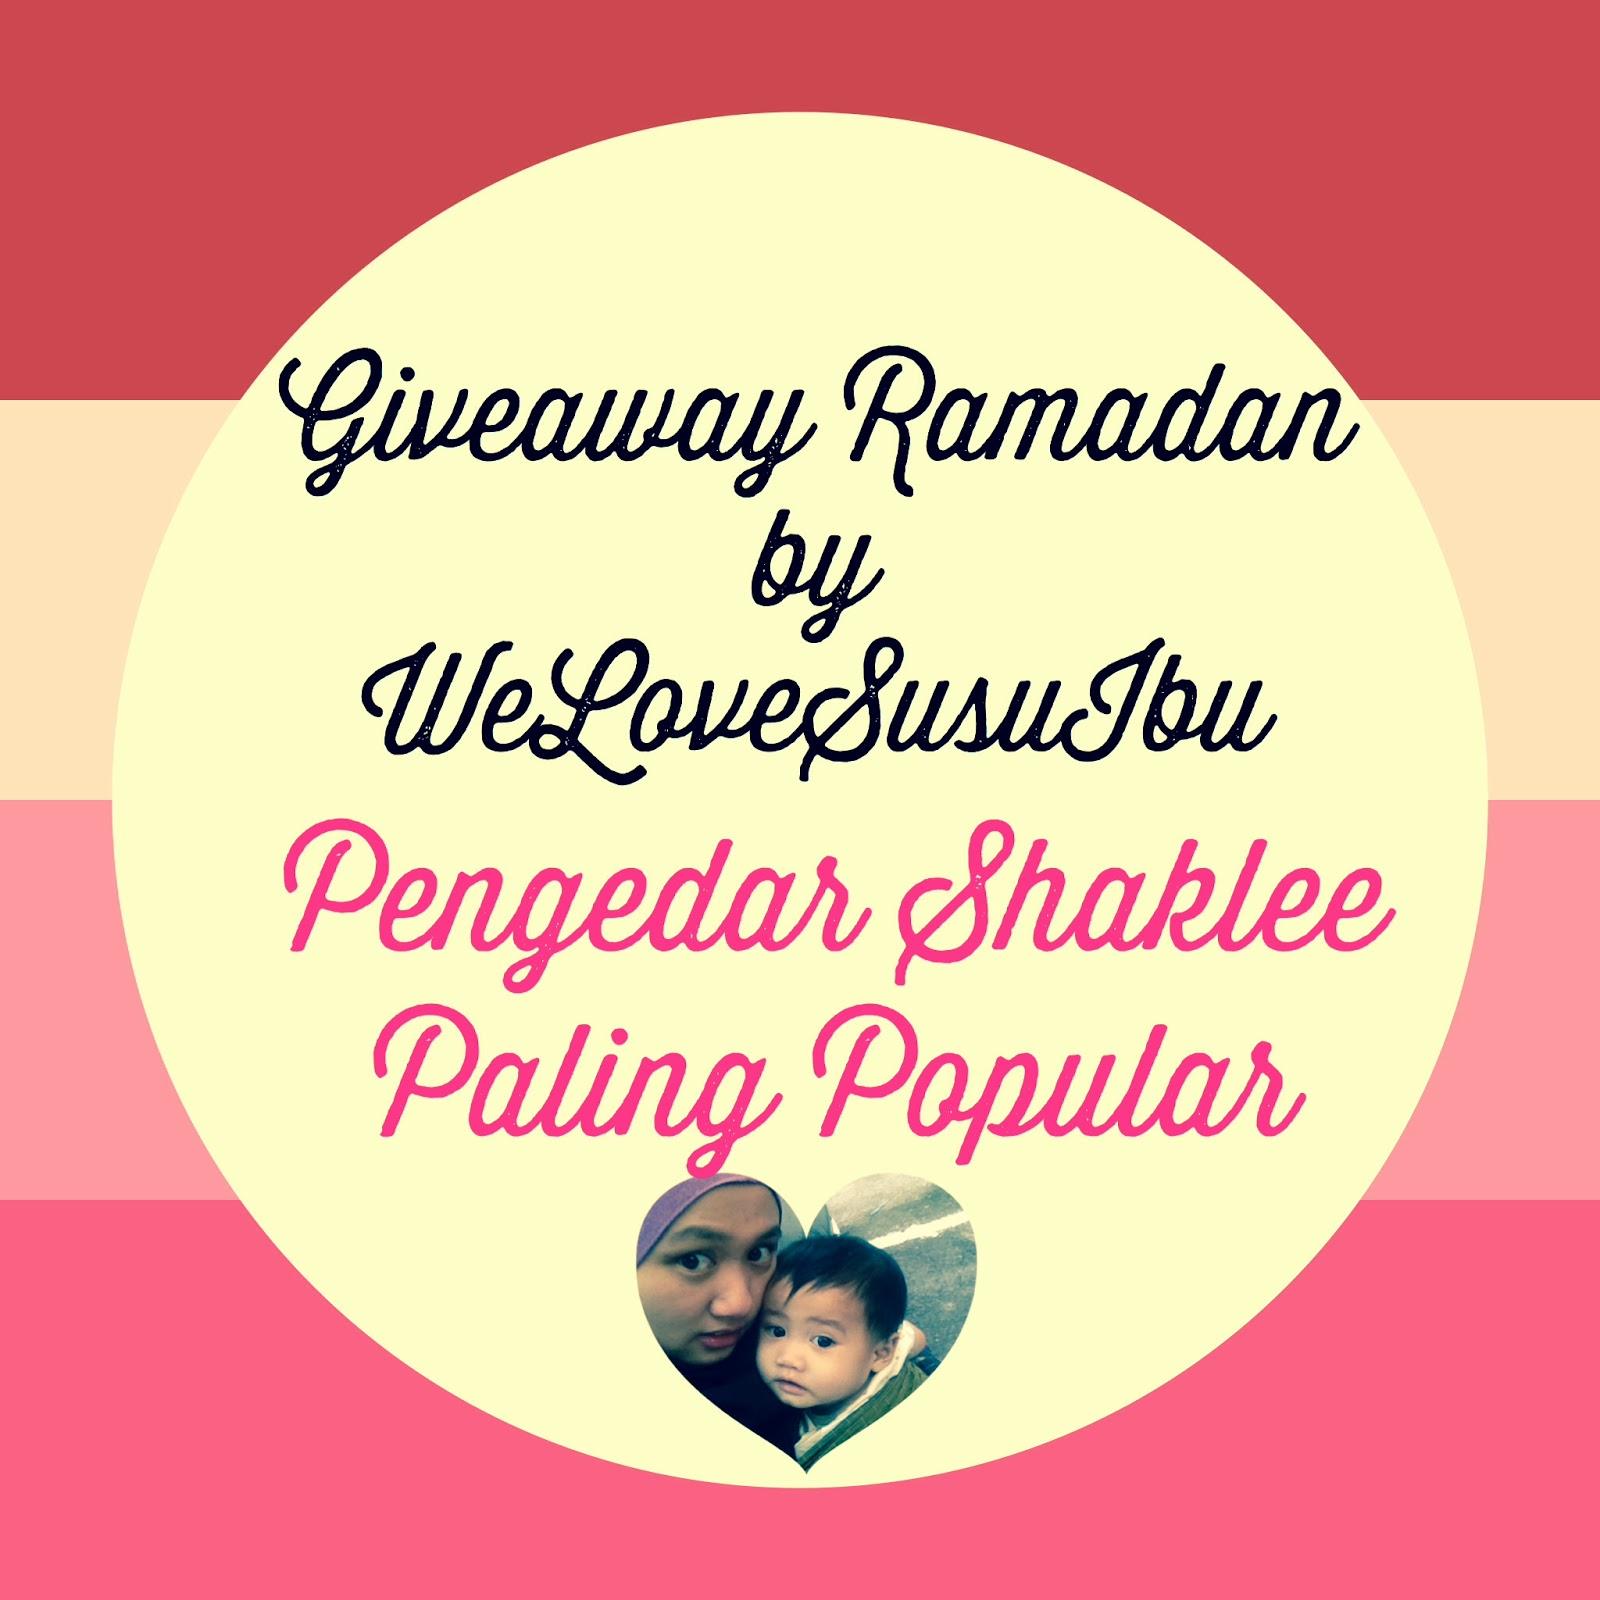 http://welovesusuibu.blogspot.com/2014/06/ramadan-giveaway-by-welovesusuibu.html